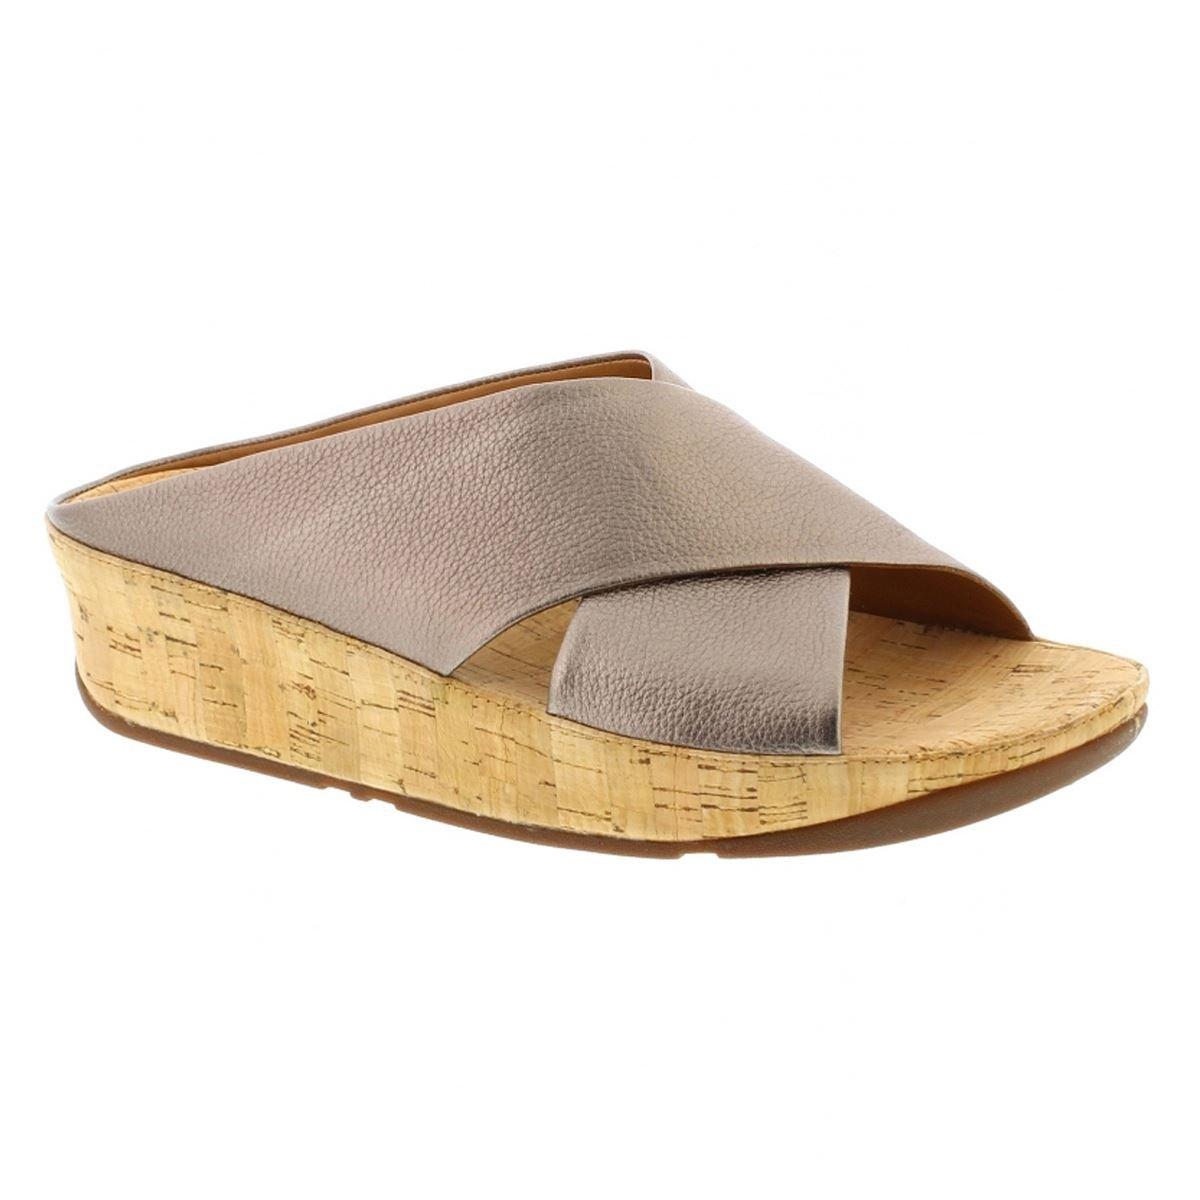 Fitflop Womens KYS Slide Open Toe Sandal Shoes, Bronze, US 8.5